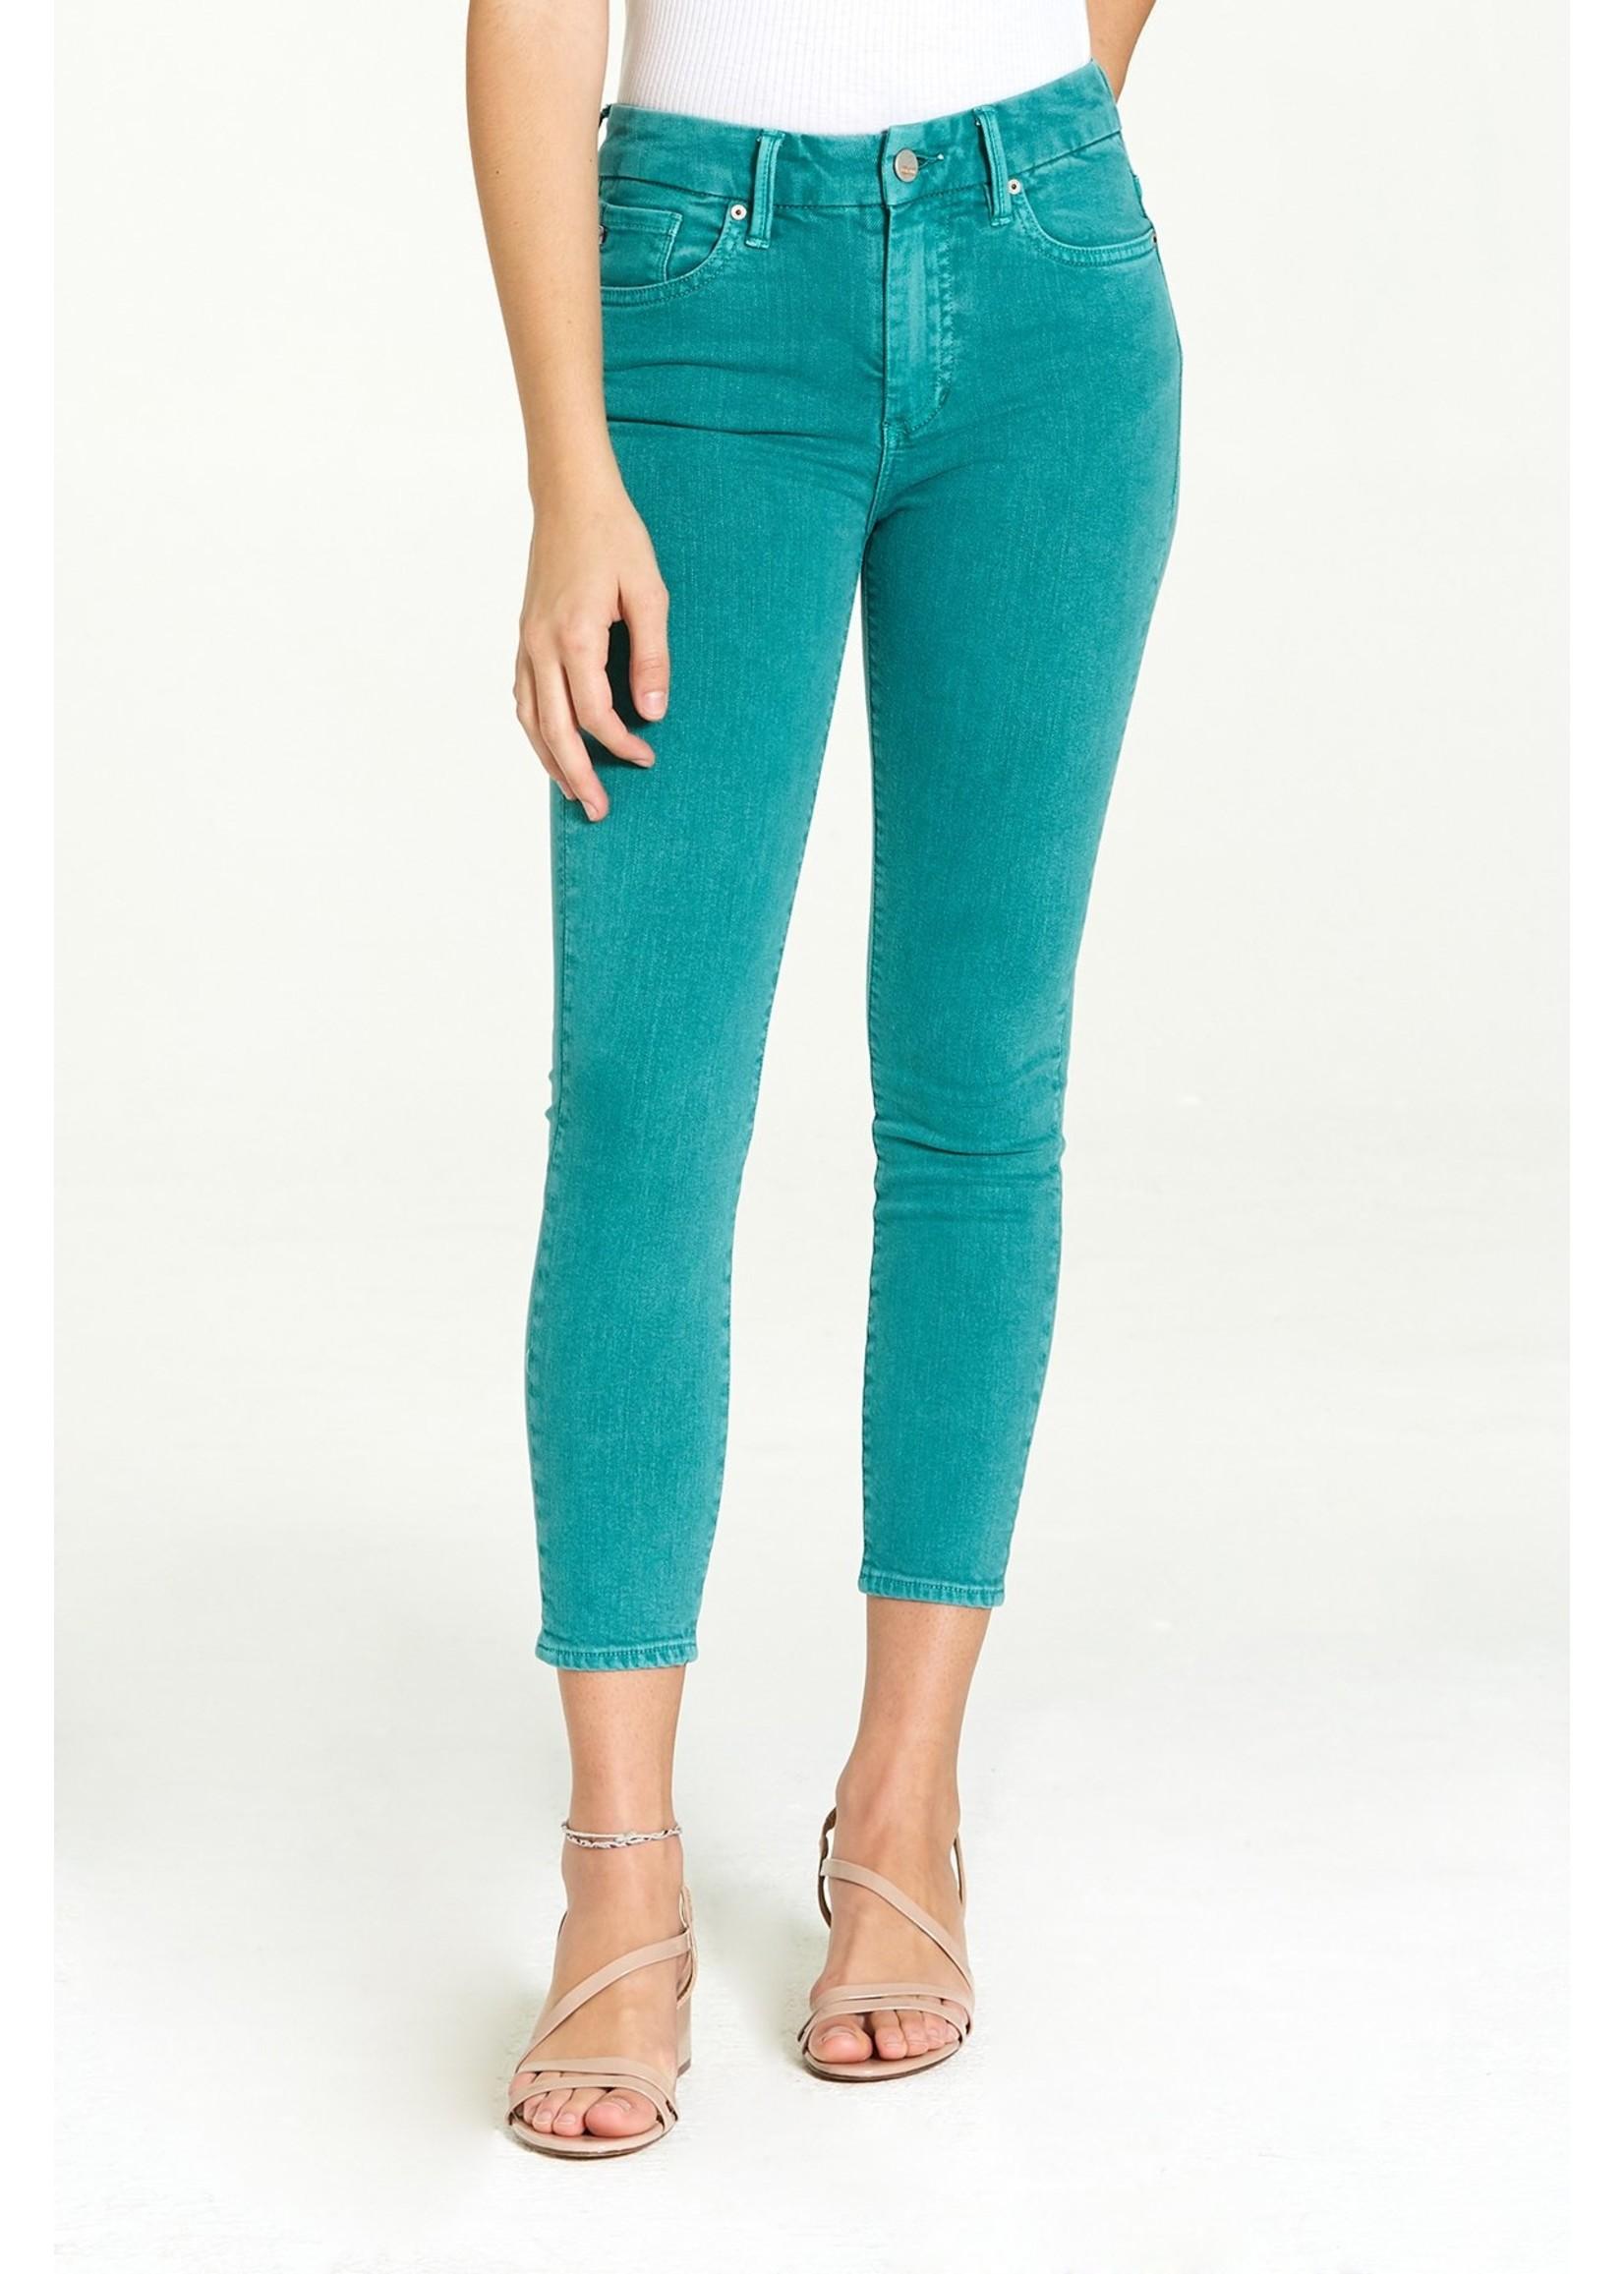 Dear John Pixie Skinny Jeans - DPM12C449BUO